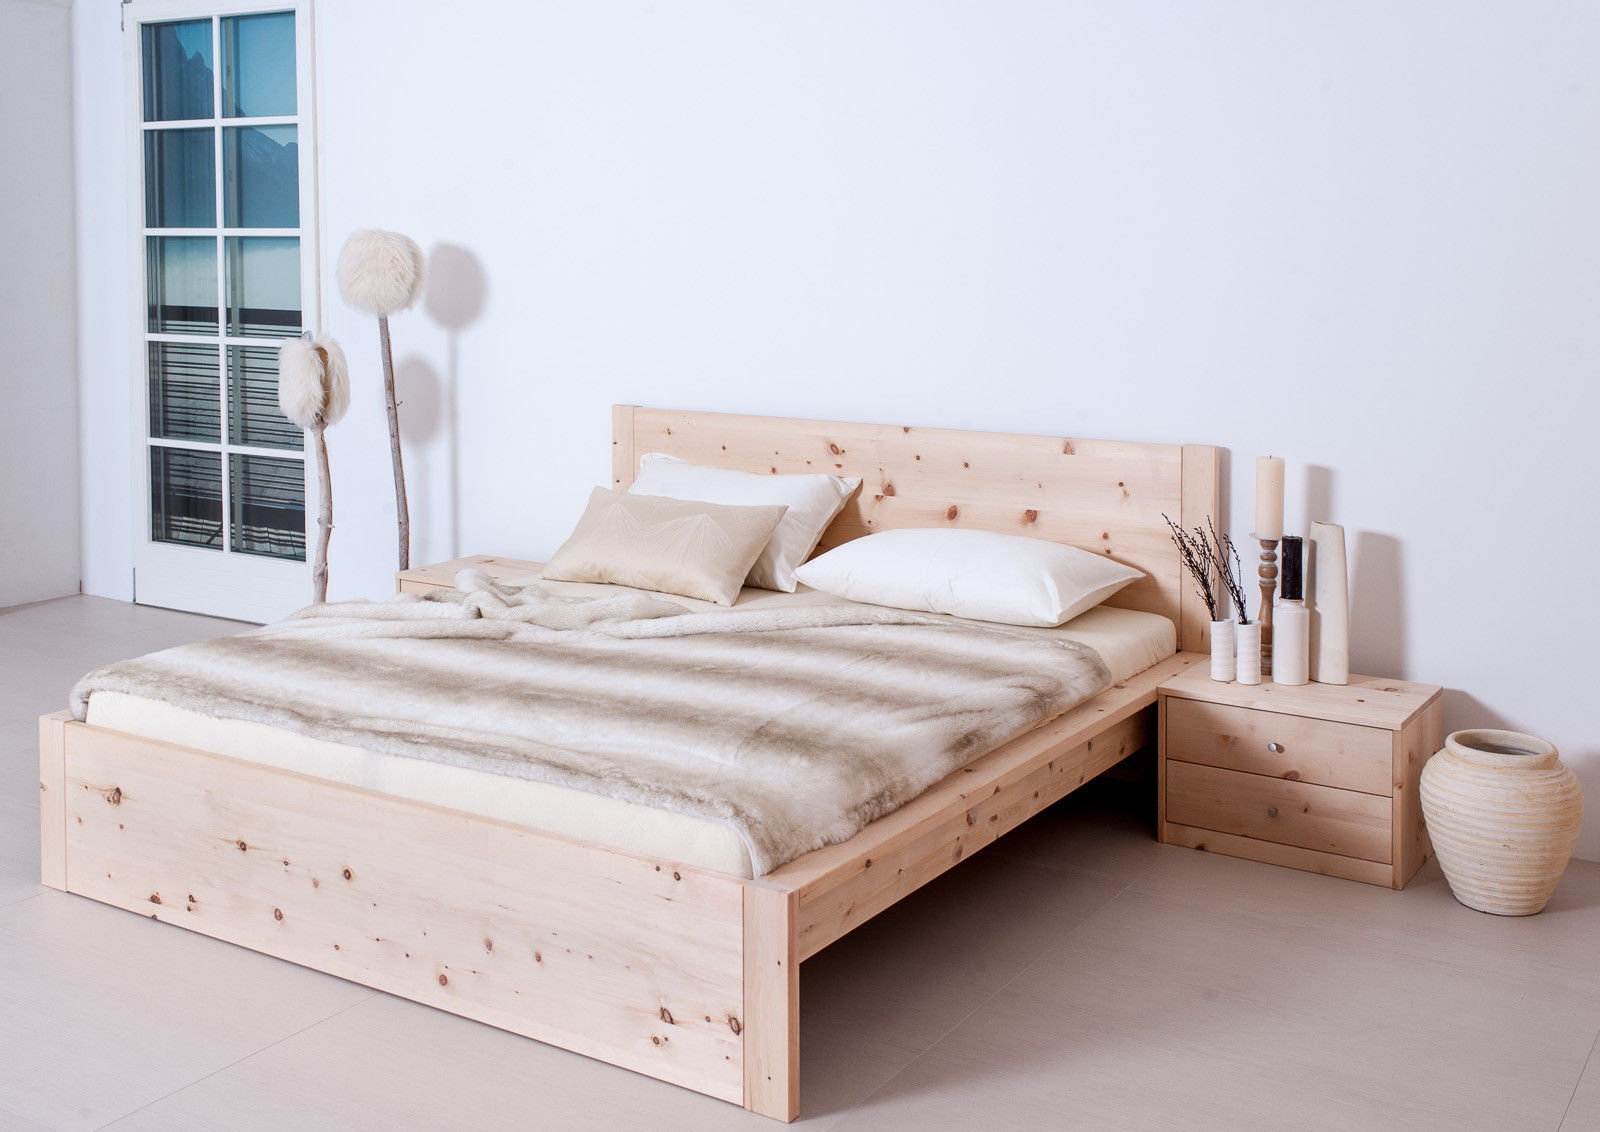 designerbett alpenkraft zirbenholz zirbenbetten betten schlafen. Black Bedroom Furniture Sets. Home Design Ideas